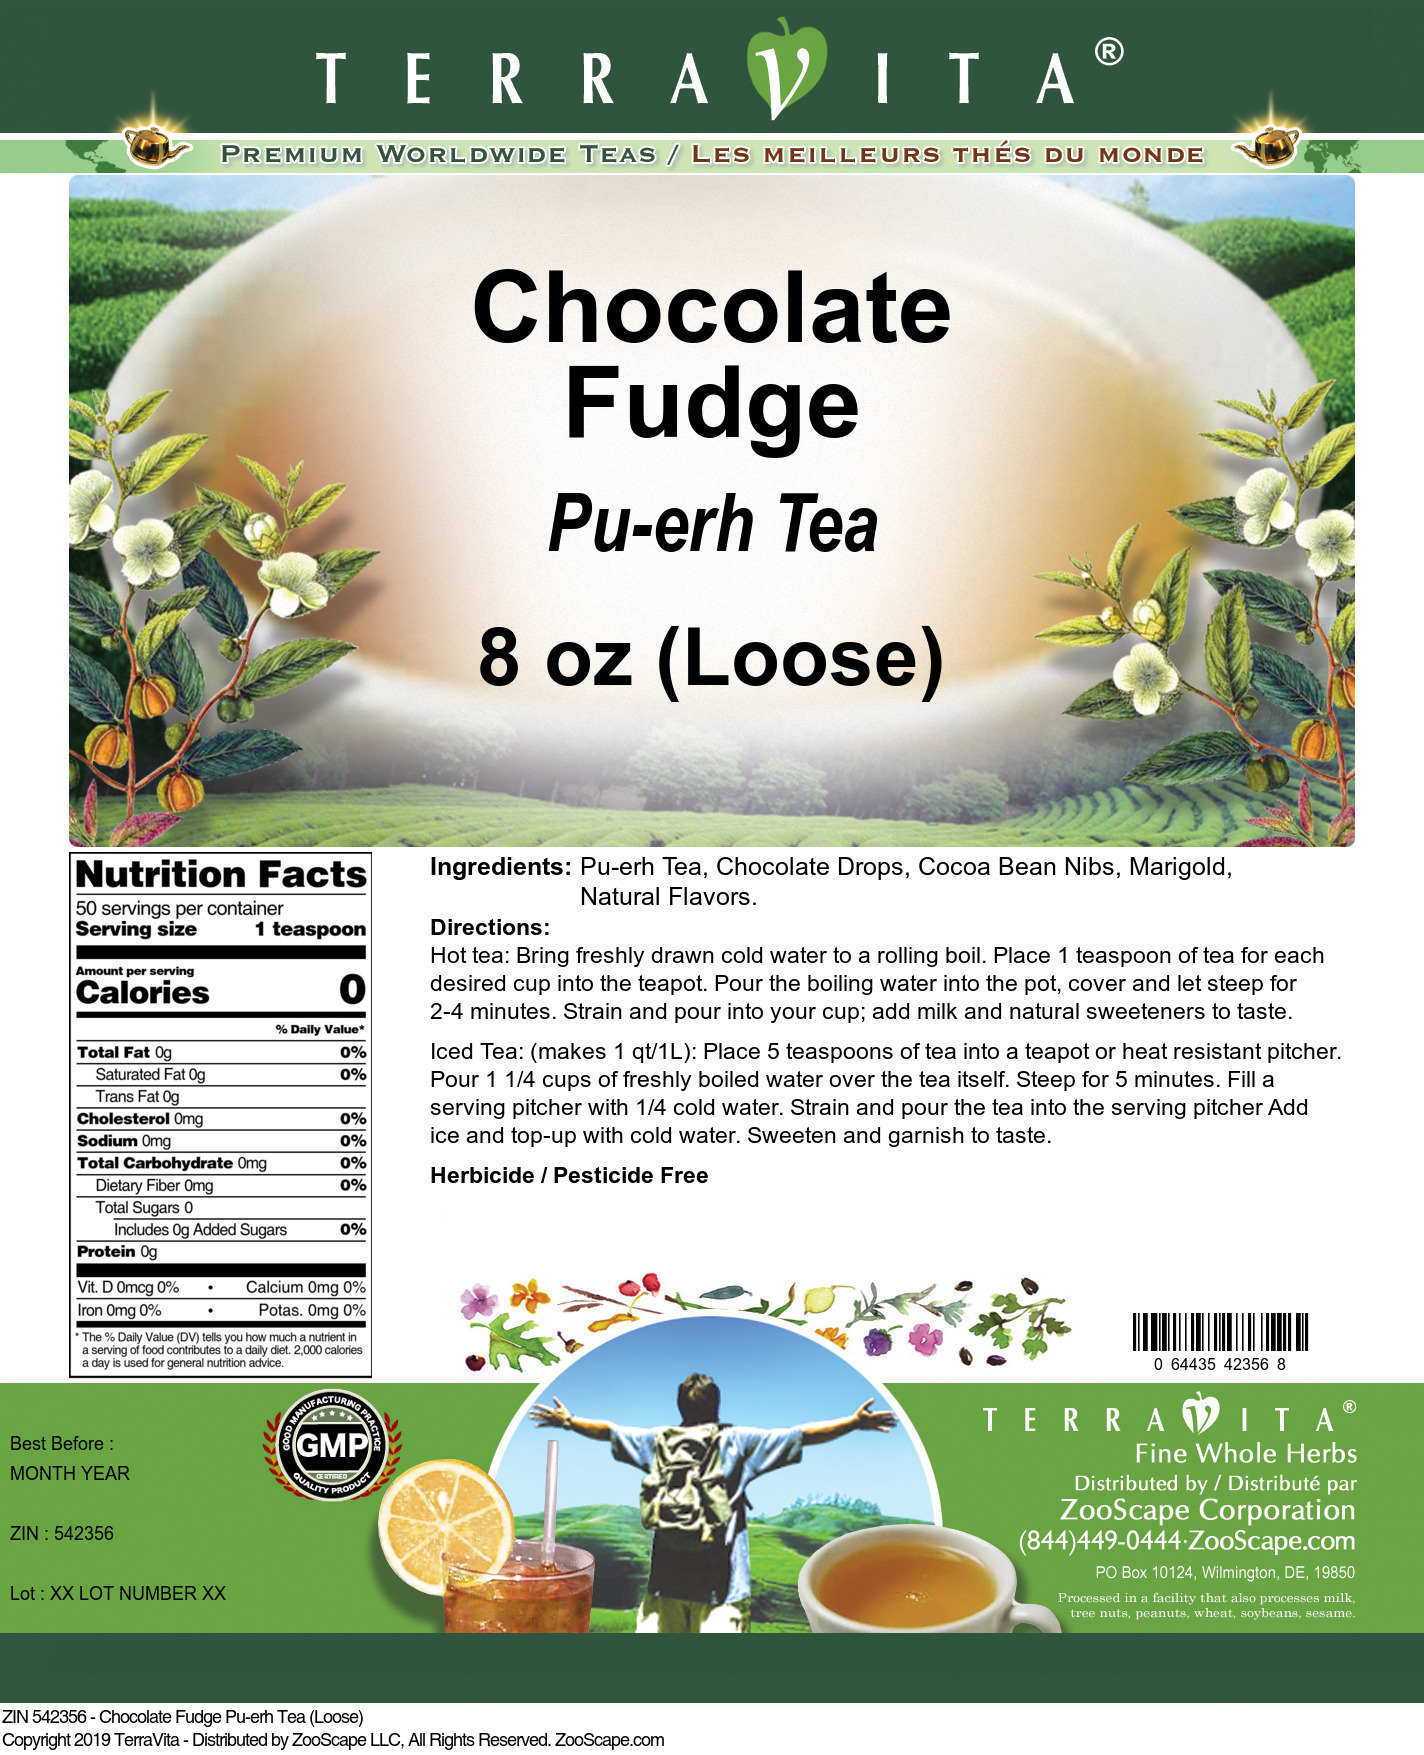 Chocolate Fudge Pu-erh Tea (Loose)